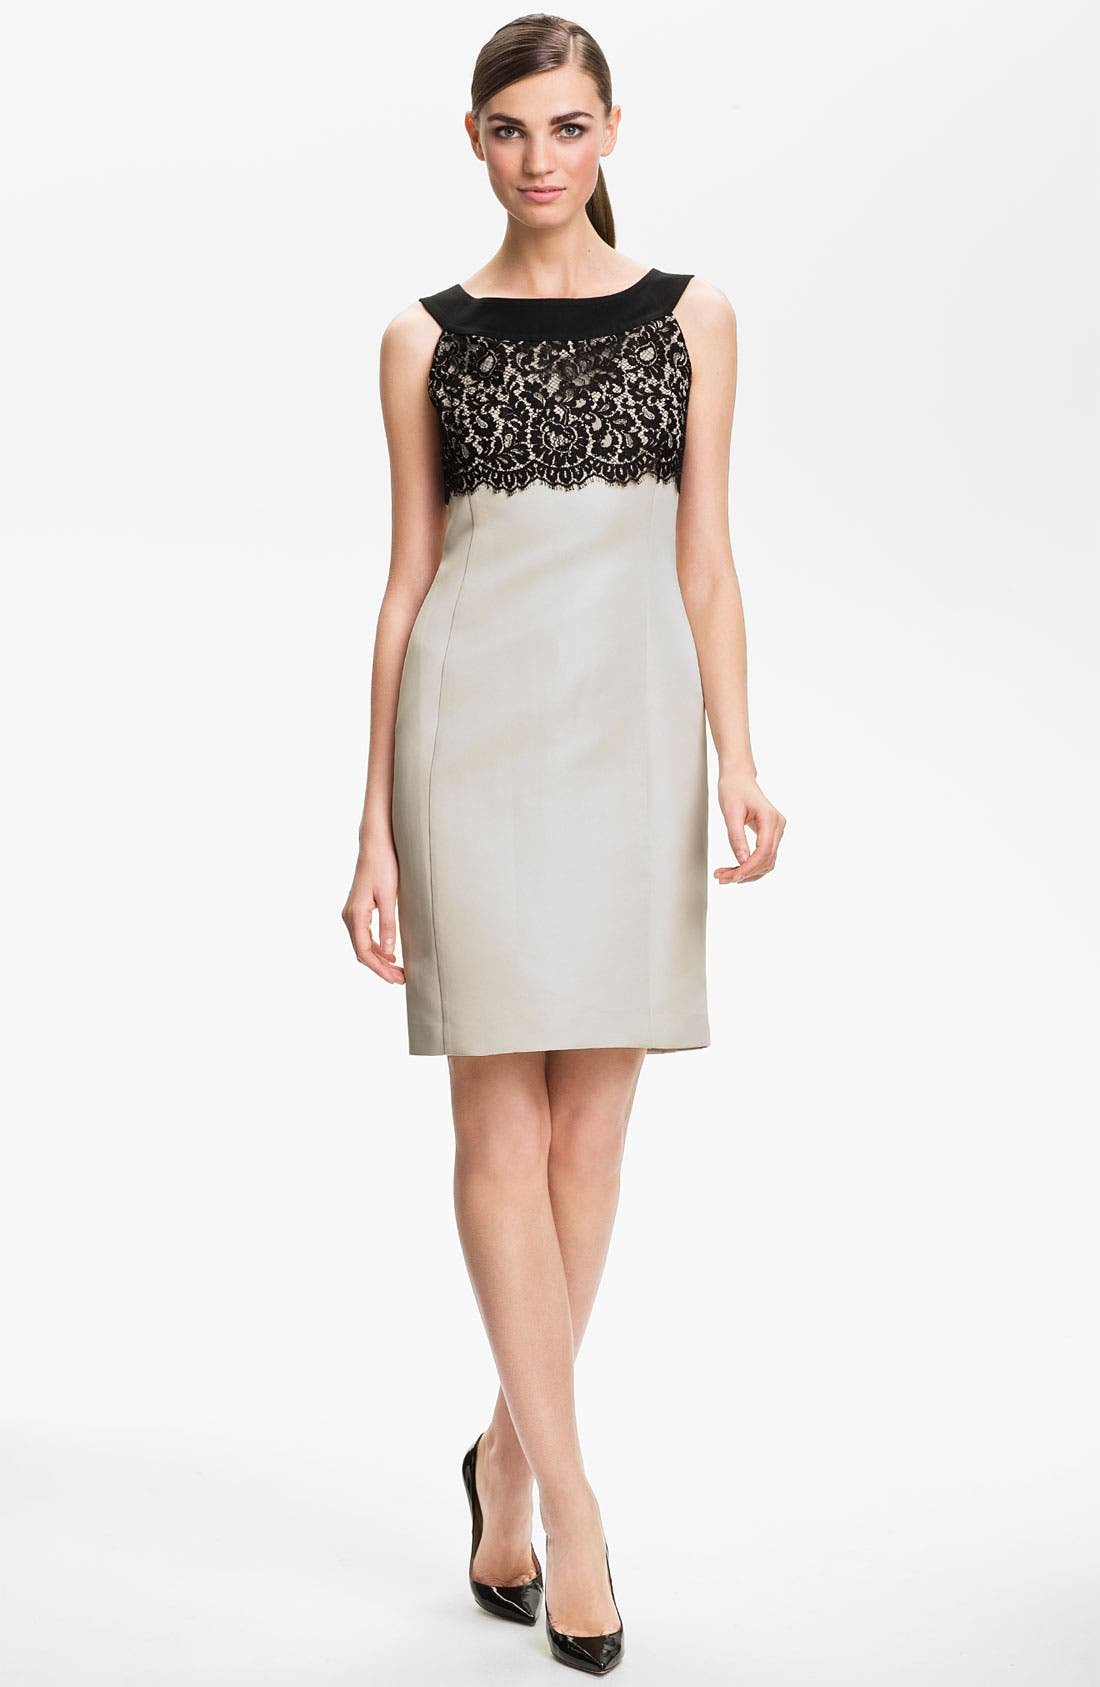 Main Image - St. John Collection Lace & Sequin Sheath Dress